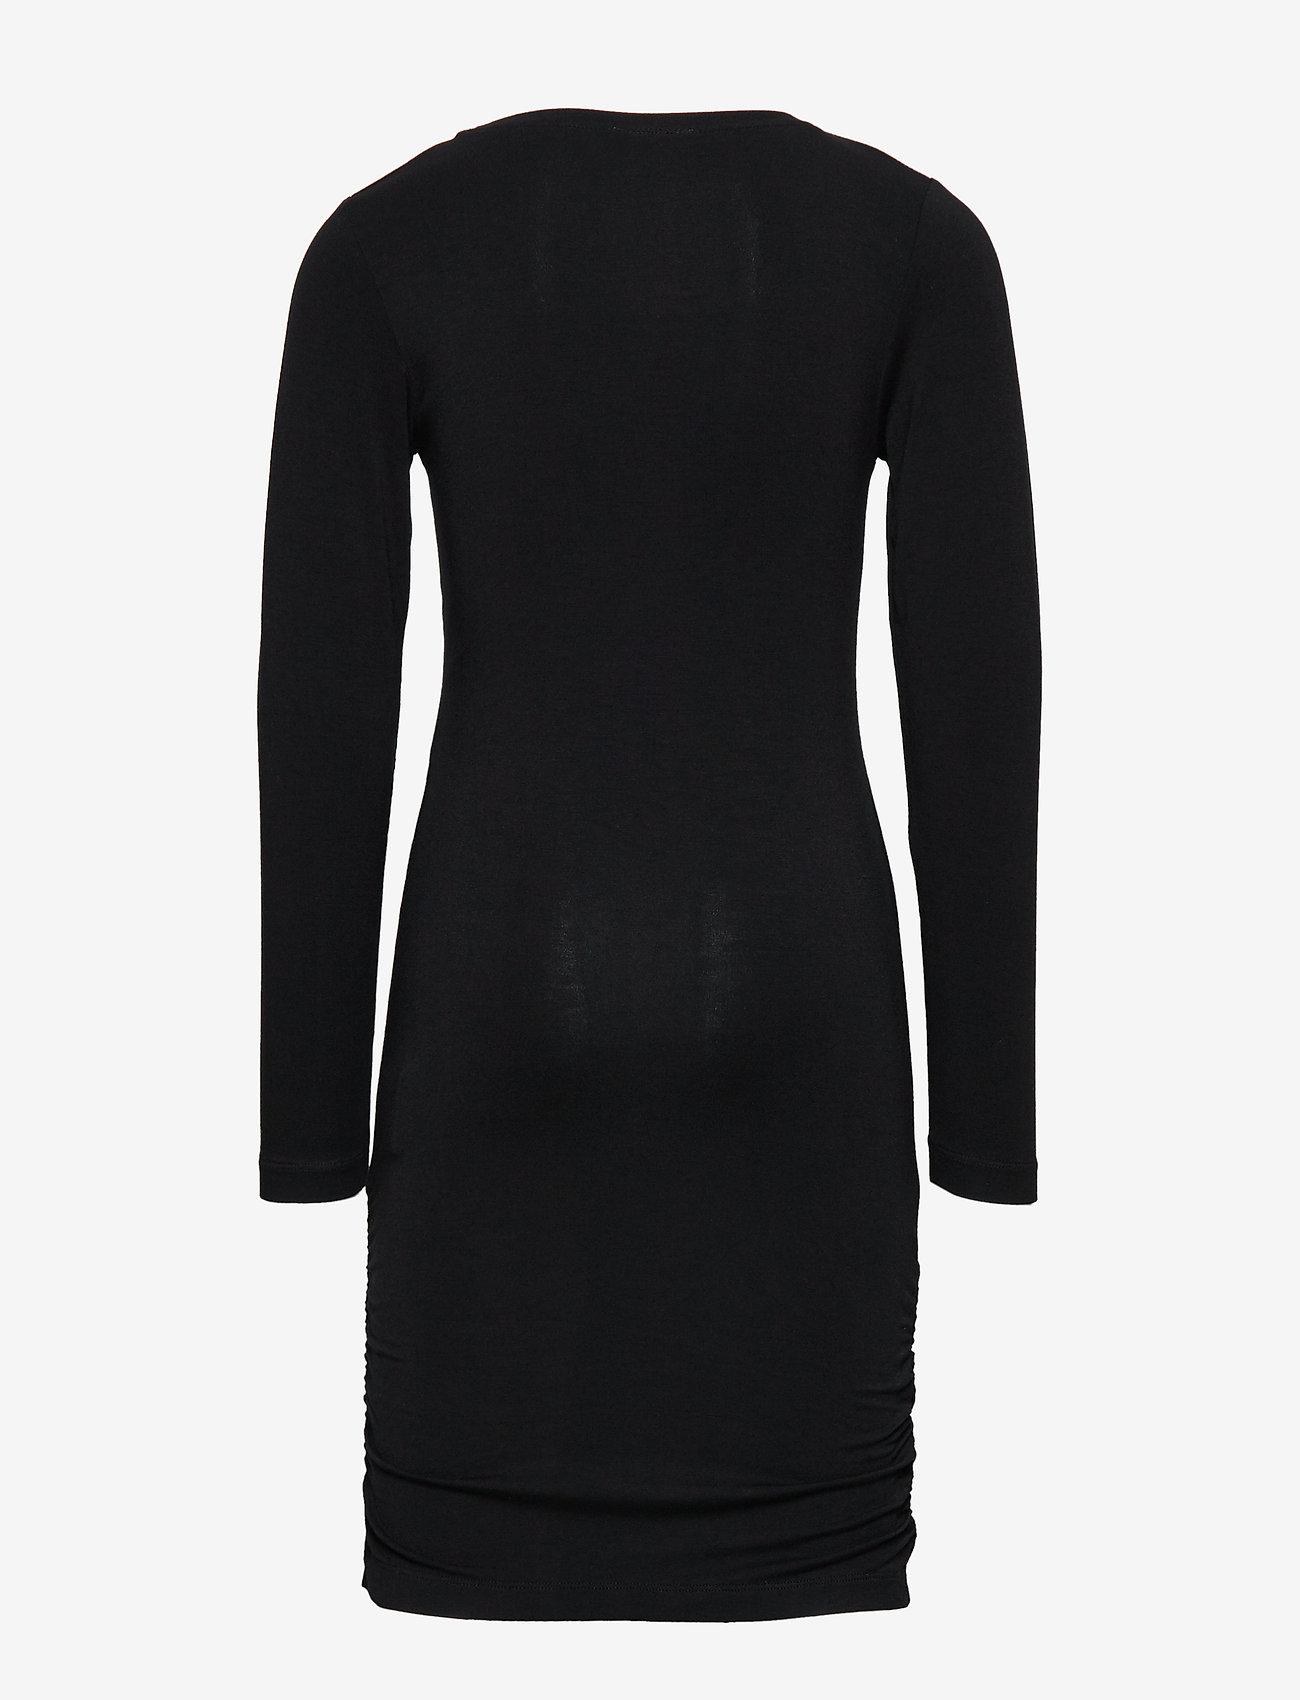 The New - ANUKA L_S DRESS - kleider - black - 1